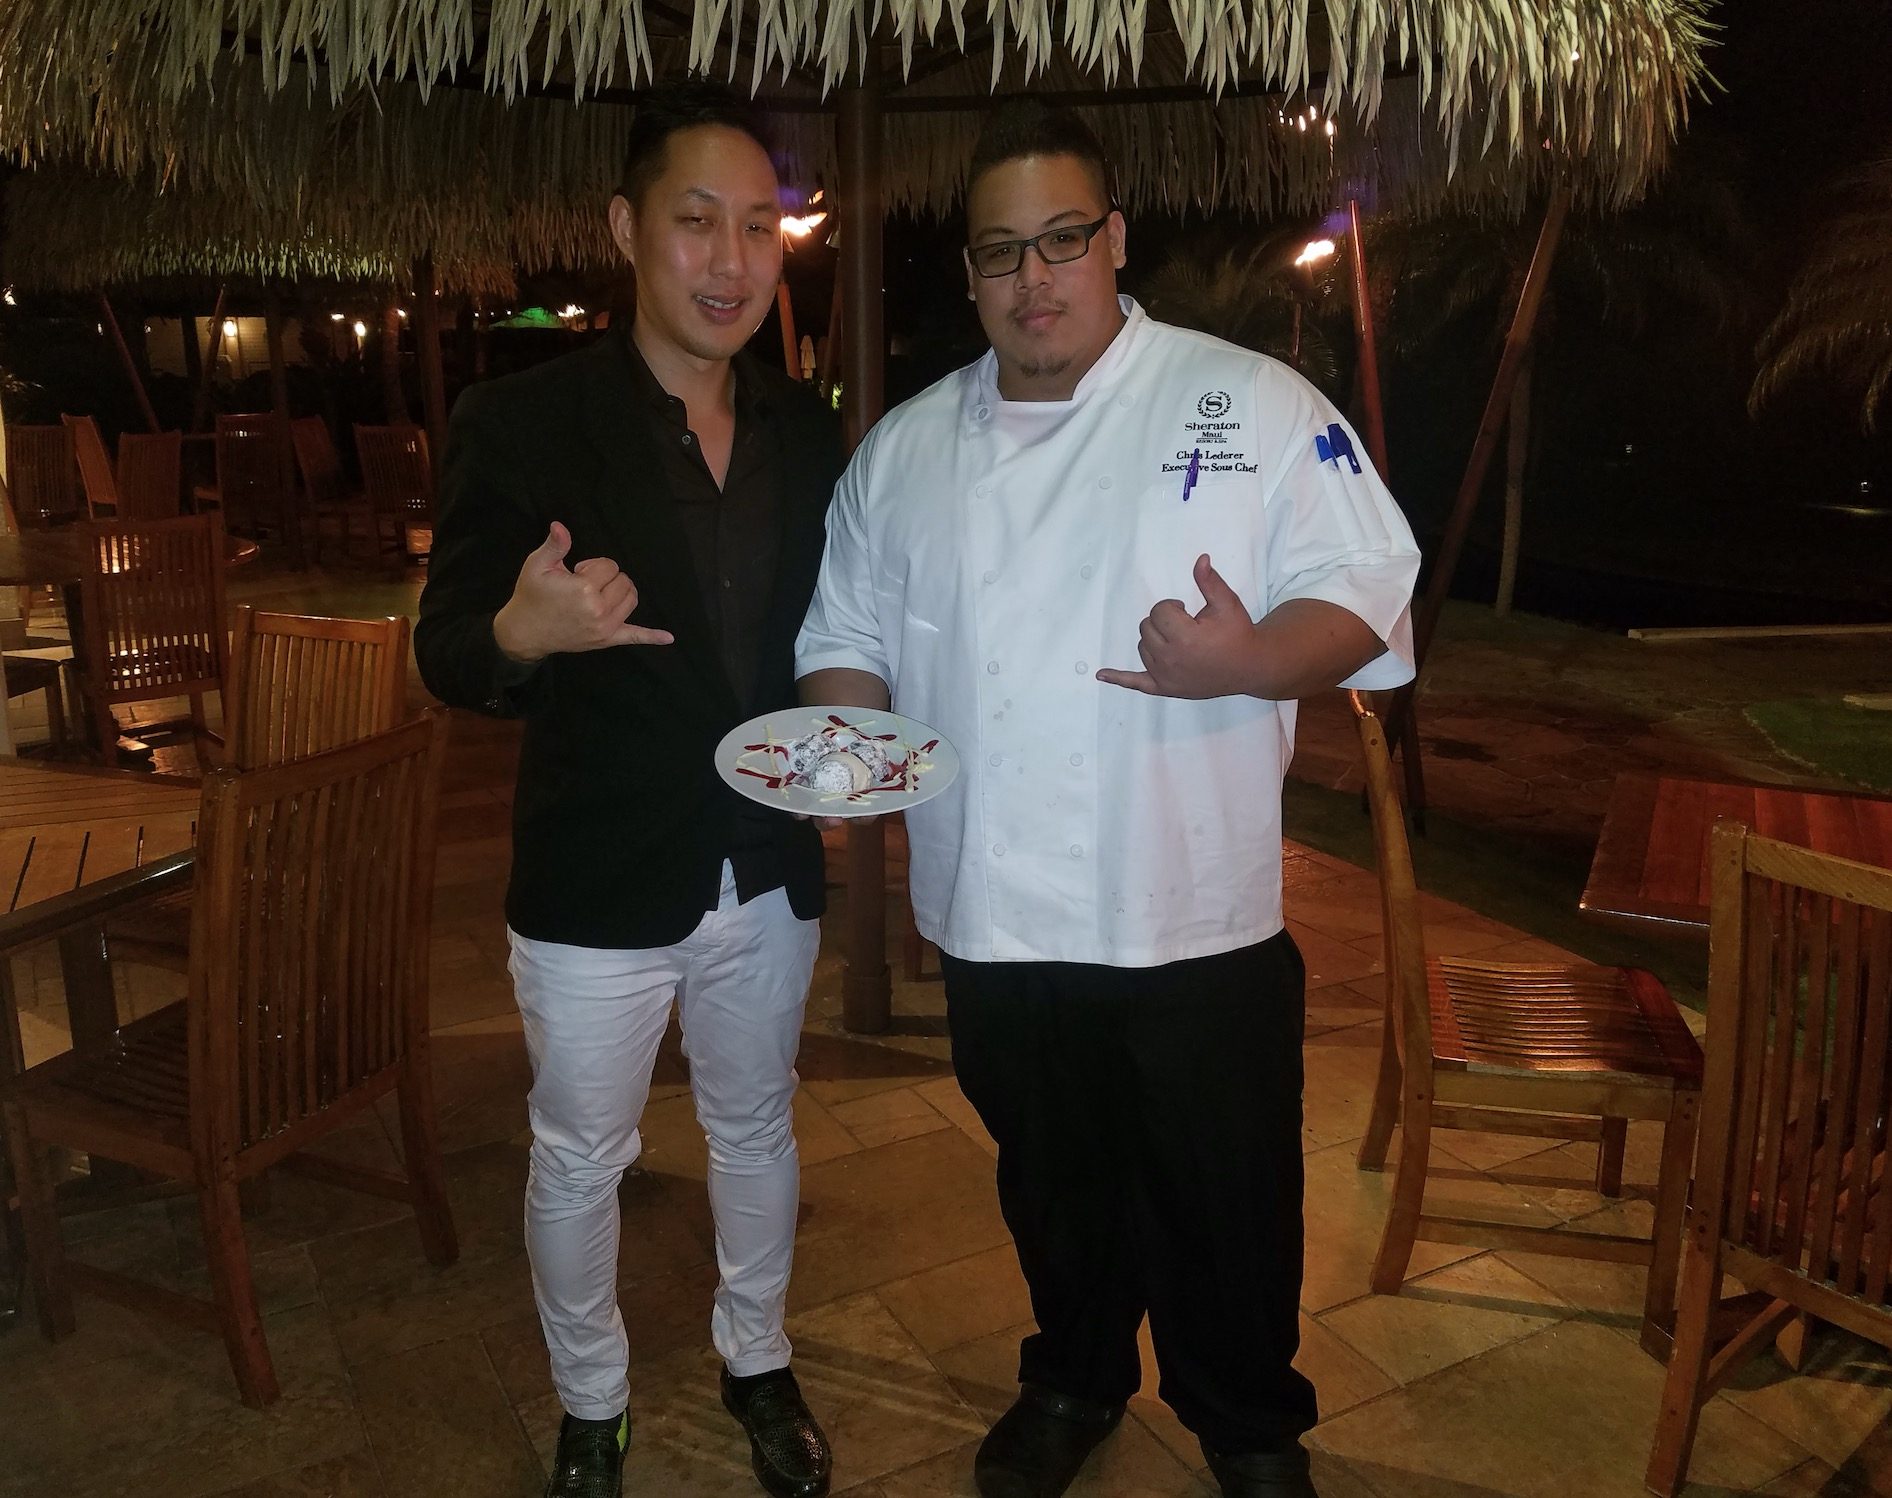 David Christopher Lee & Executive Sous Chef Chris Lederer